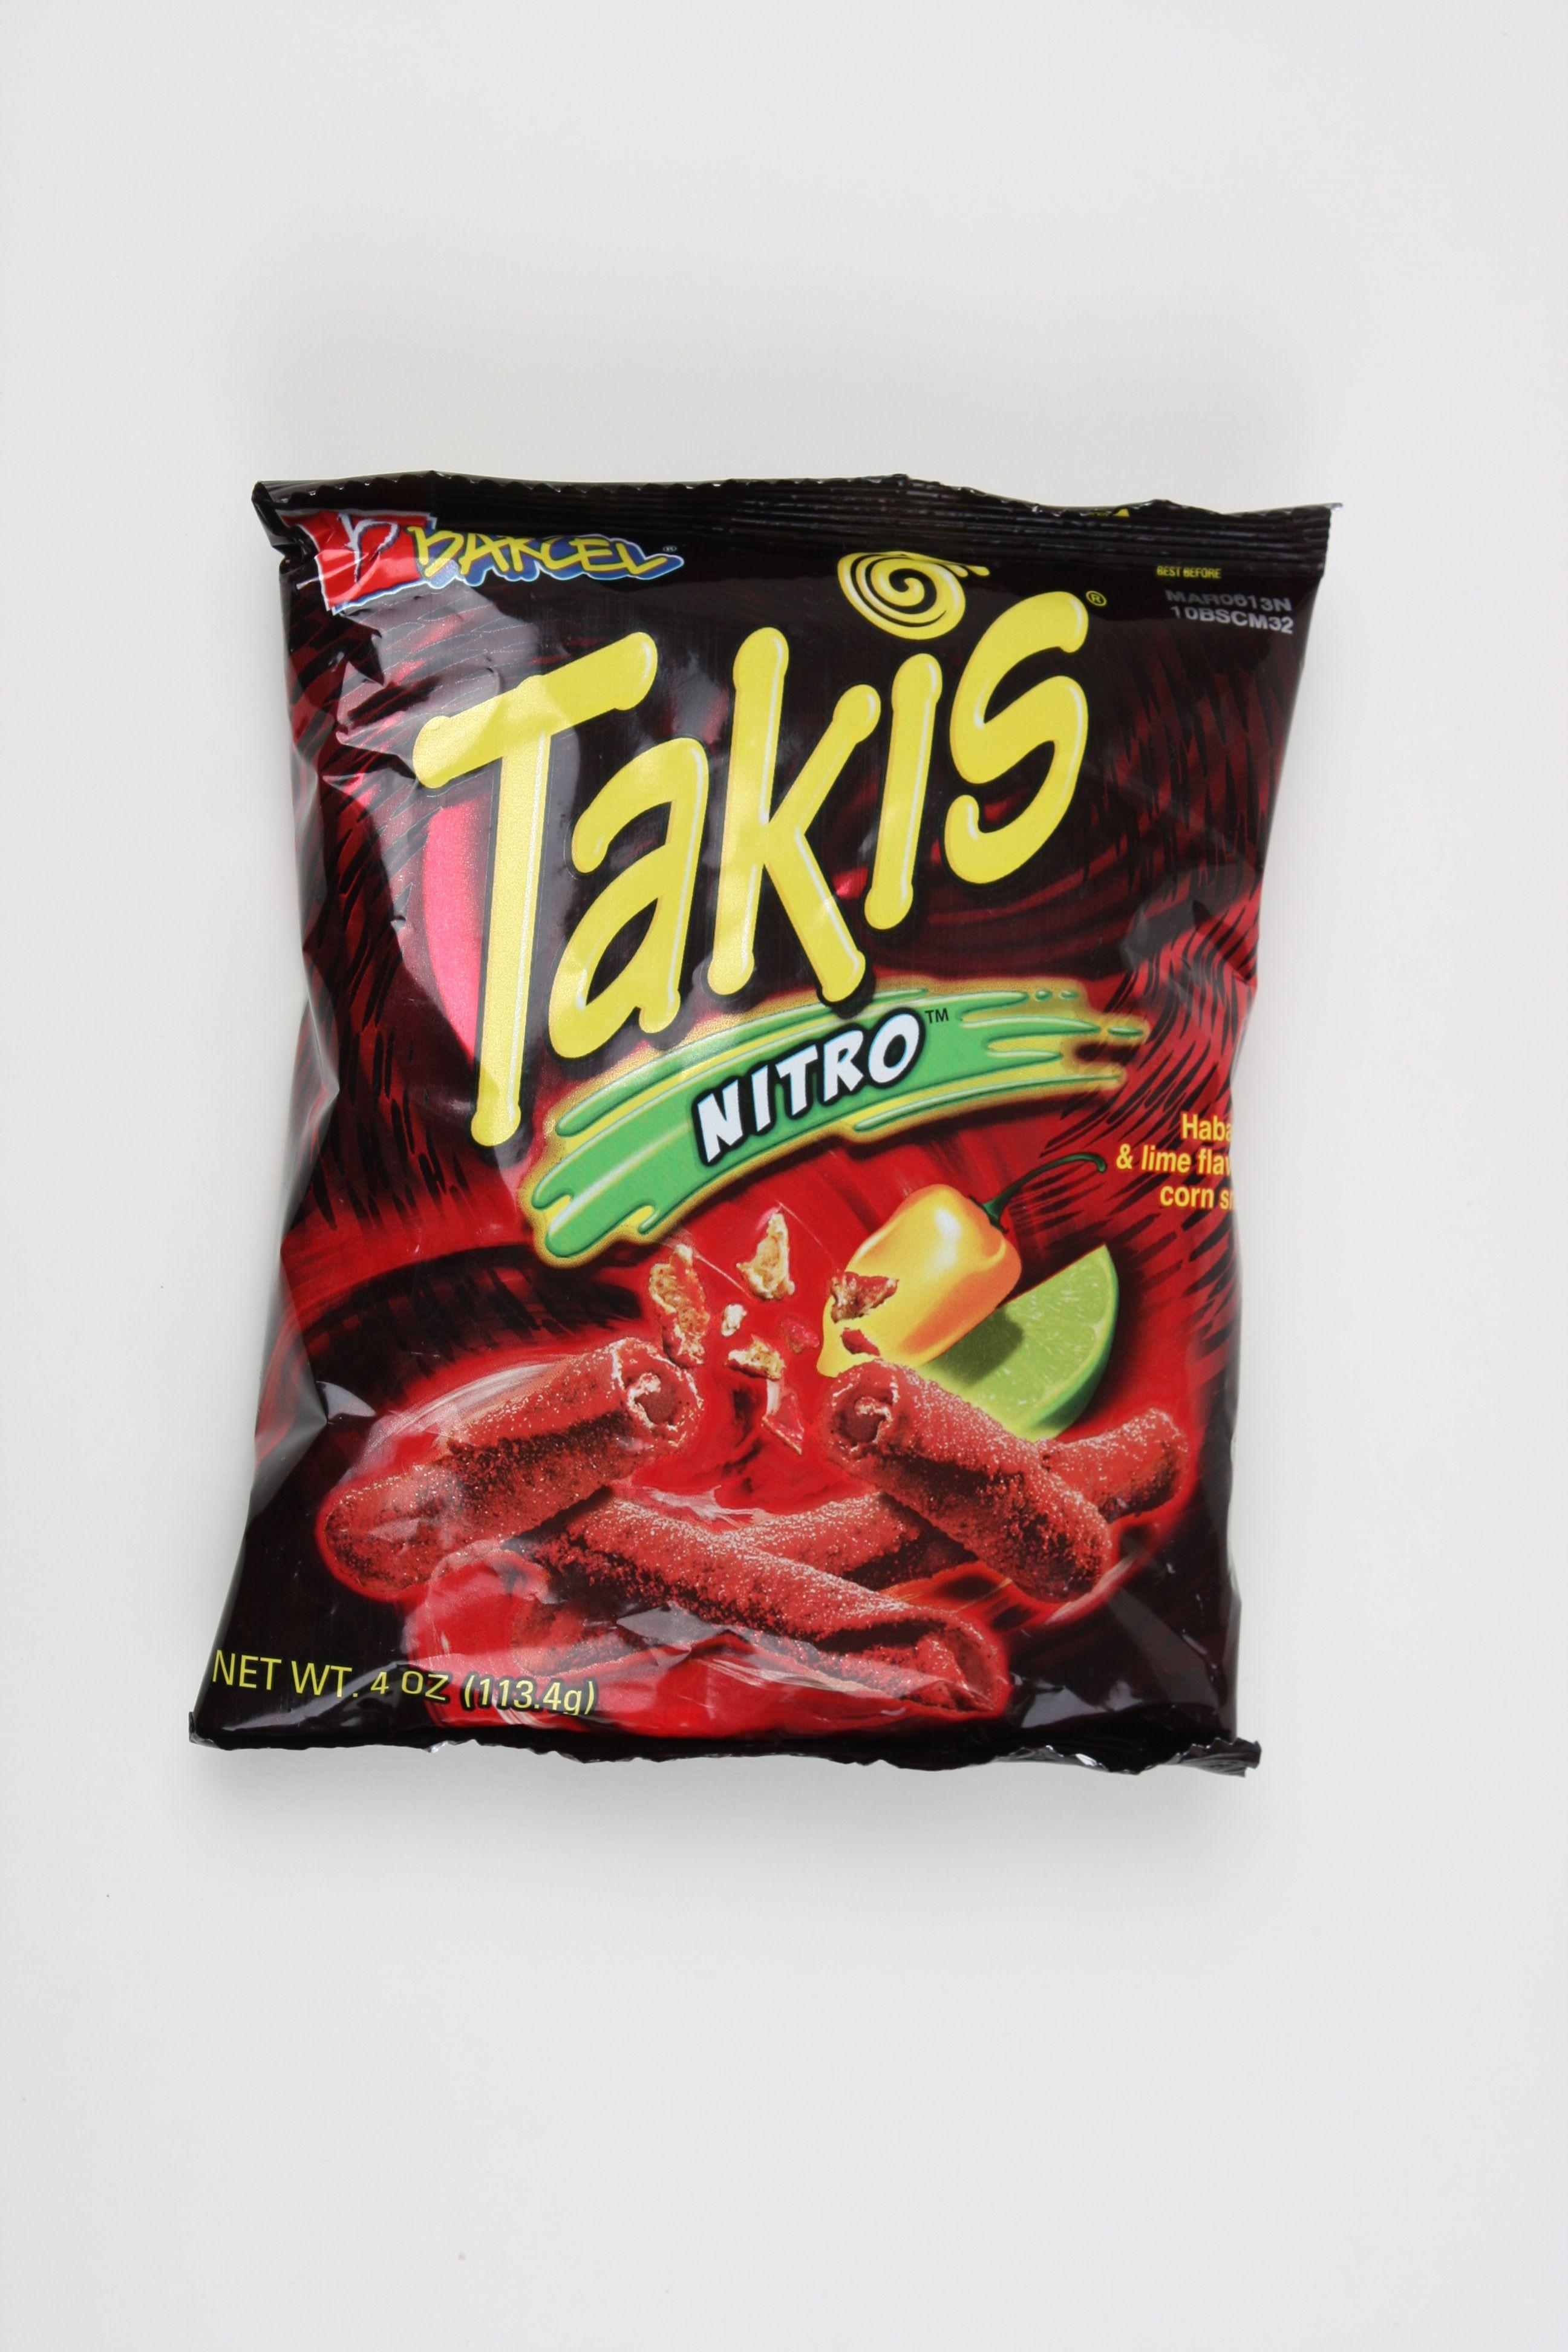 takis chips | barcel takis nitro 4oz bag 16 pack | chips ♡ in 2018